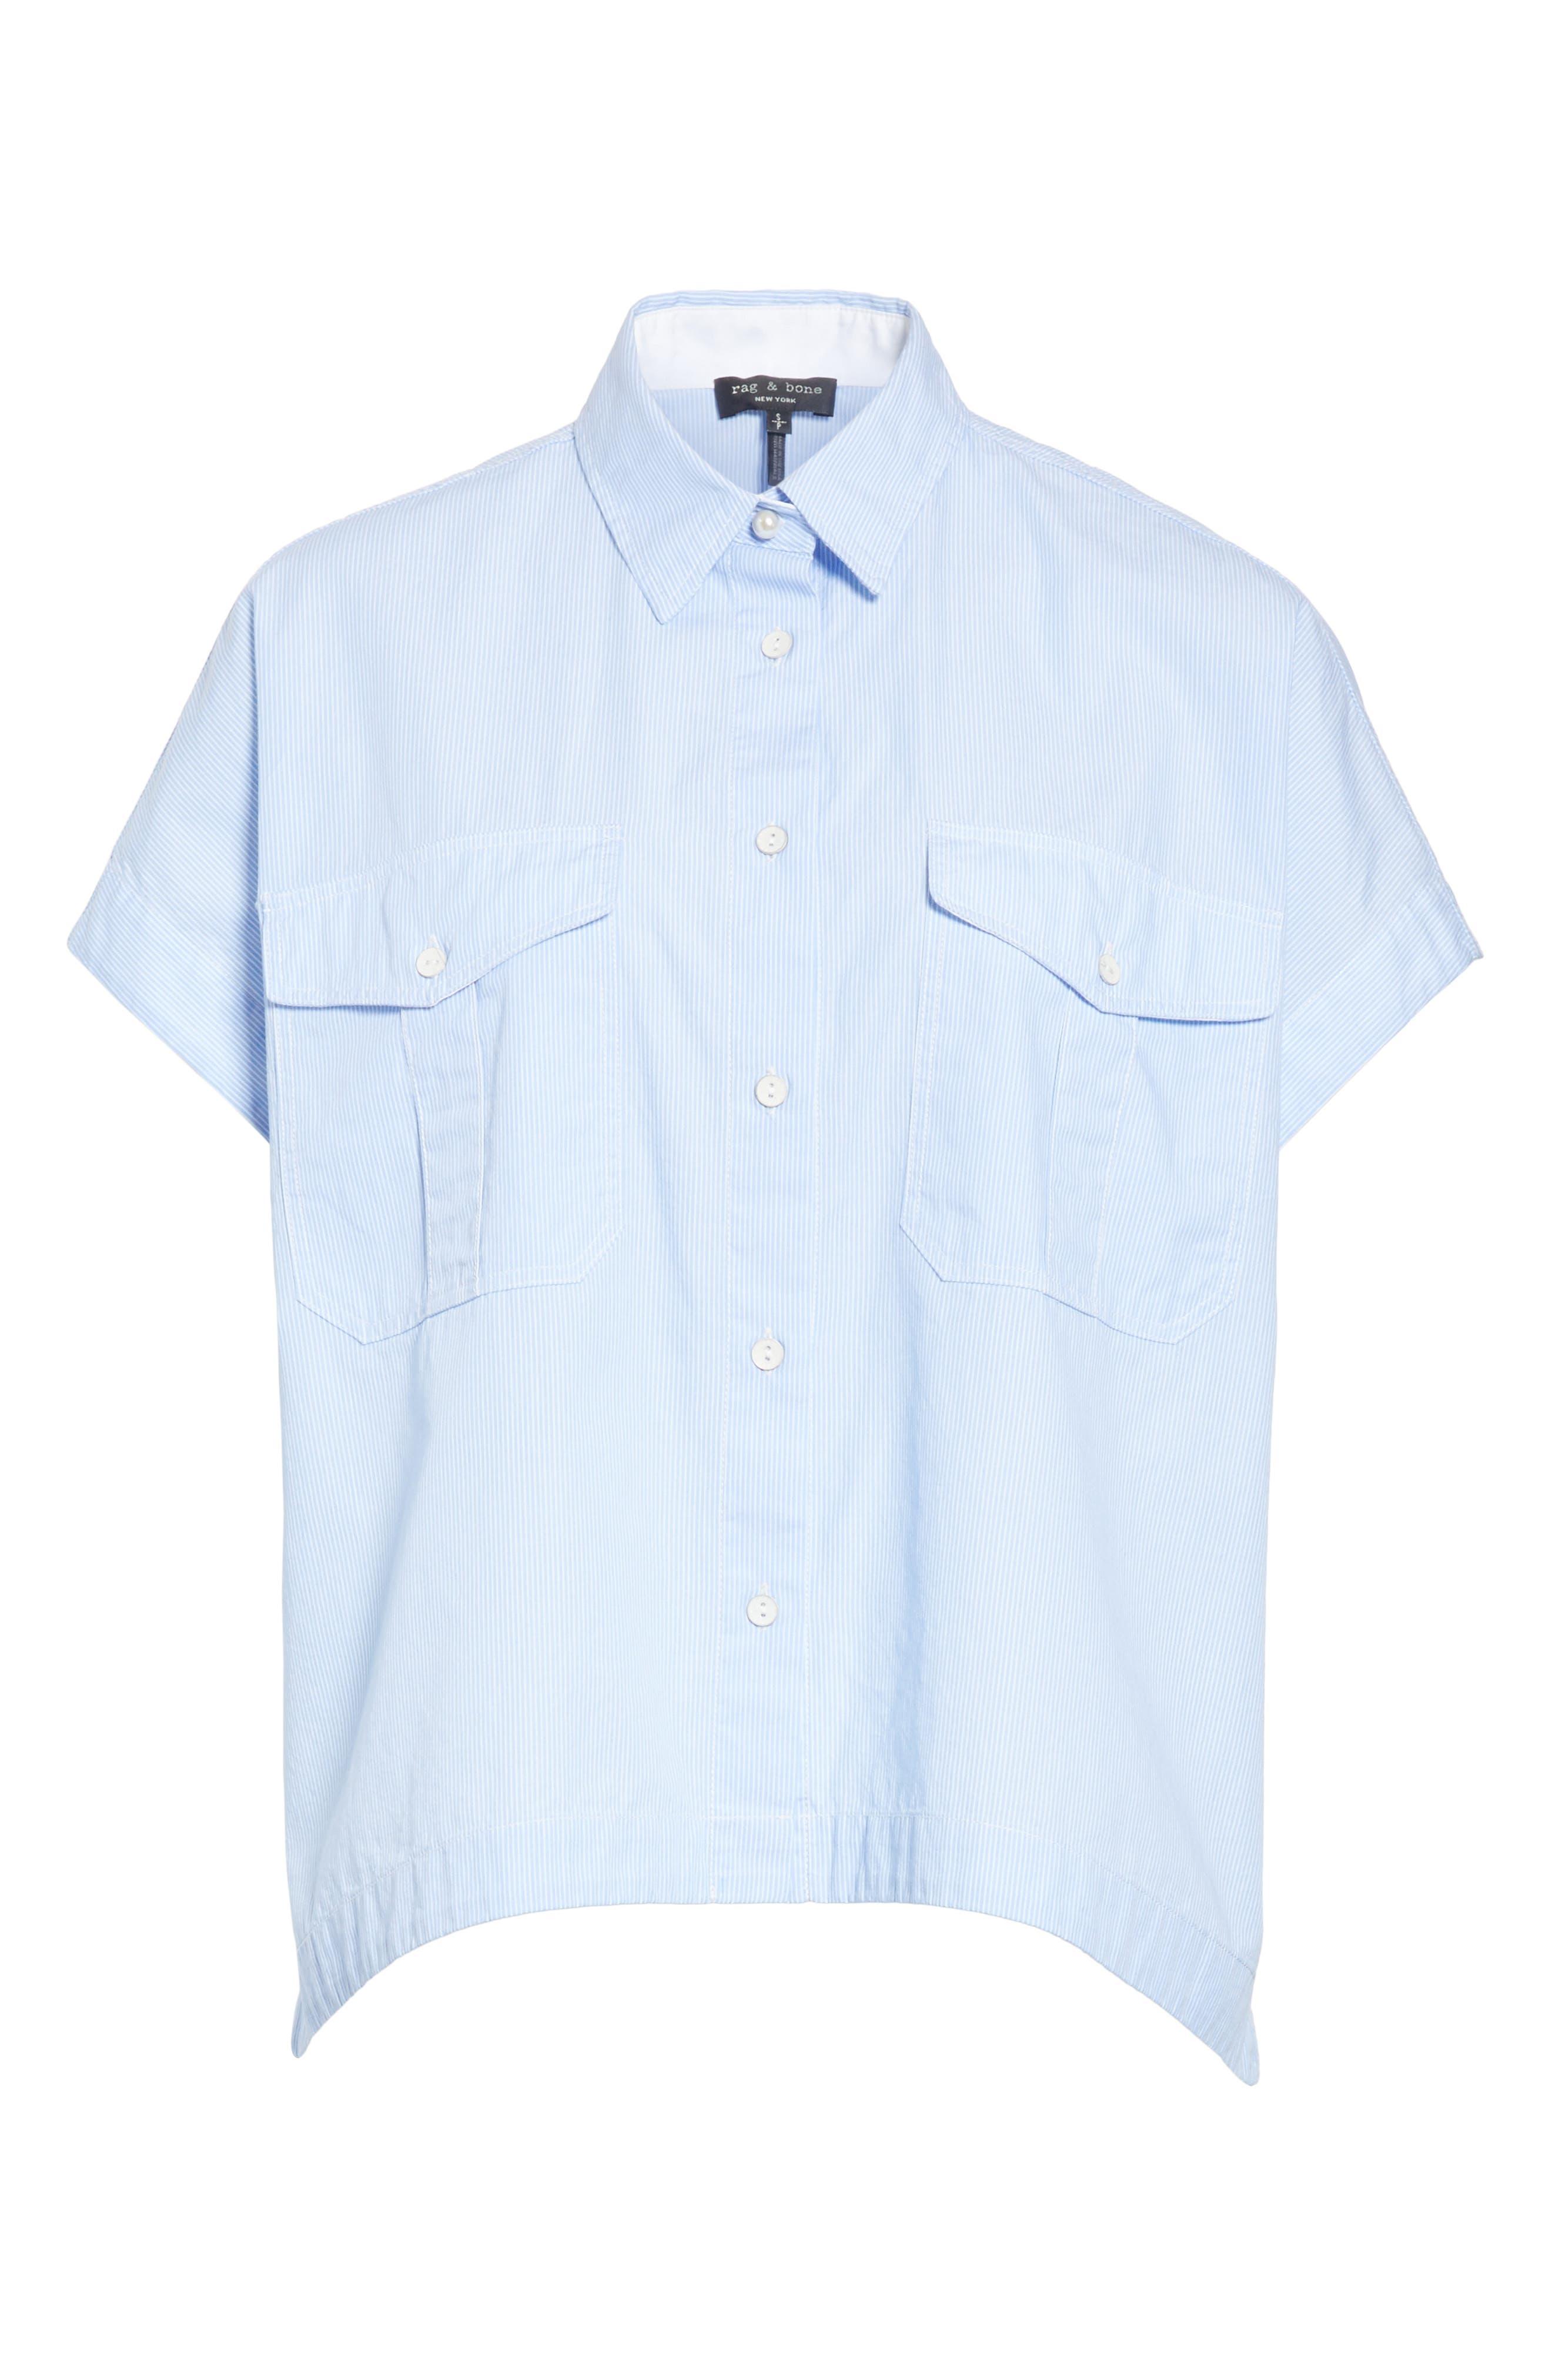 Pearson Shirt,                             Alternate thumbnail 6, color,